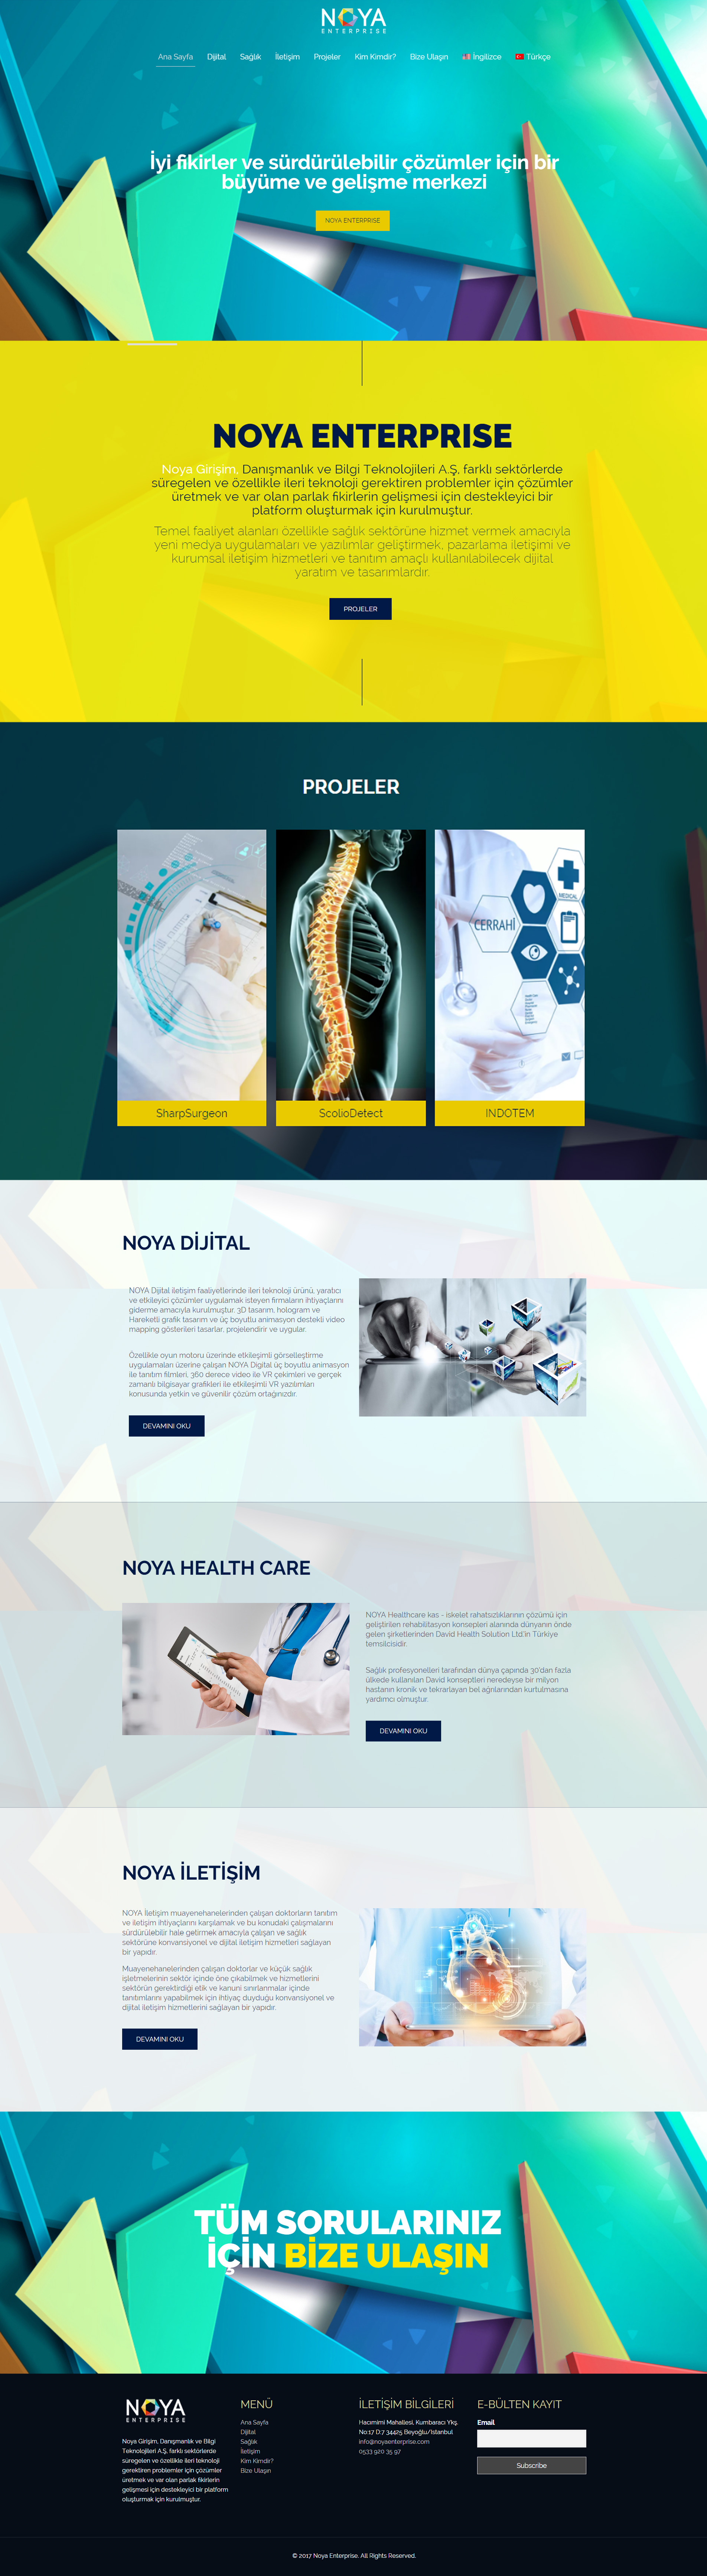 artcore-digital-noyaentrprise-website